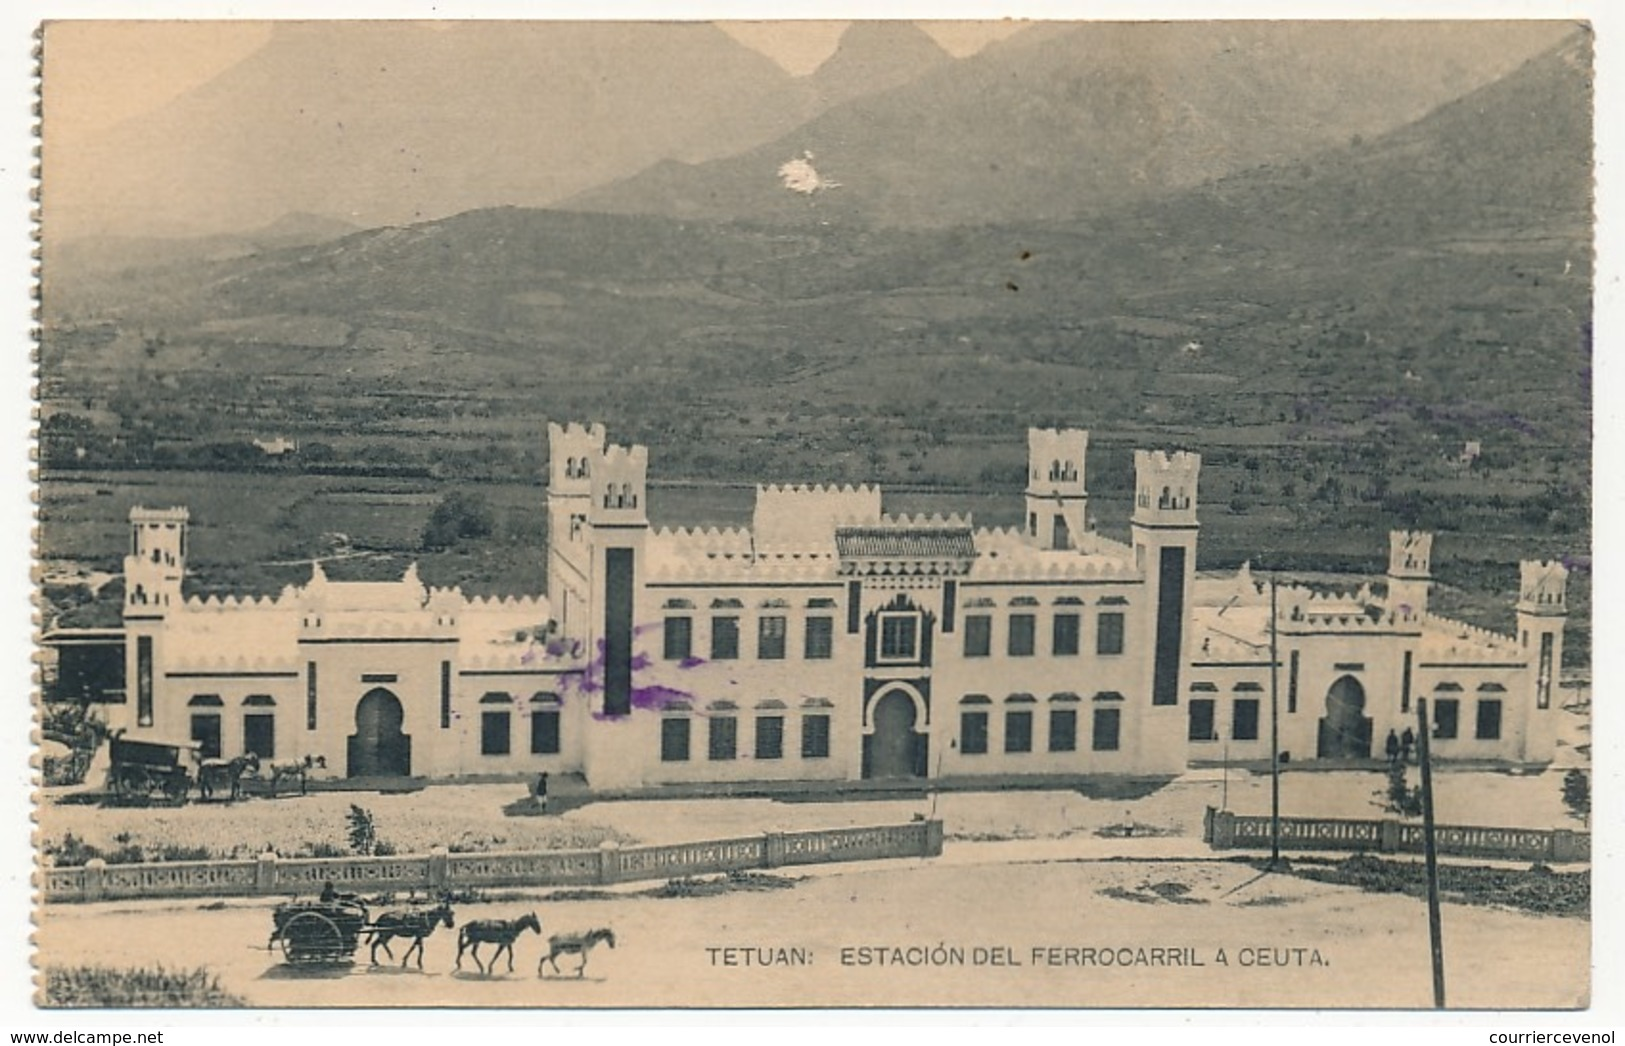 "MAROC ESPAGNOL - Carte Postale Affr. Composé TP Surchargés ""Zona Protectorado Espanol"" TETUAN 1926 - Spanish Morocco"